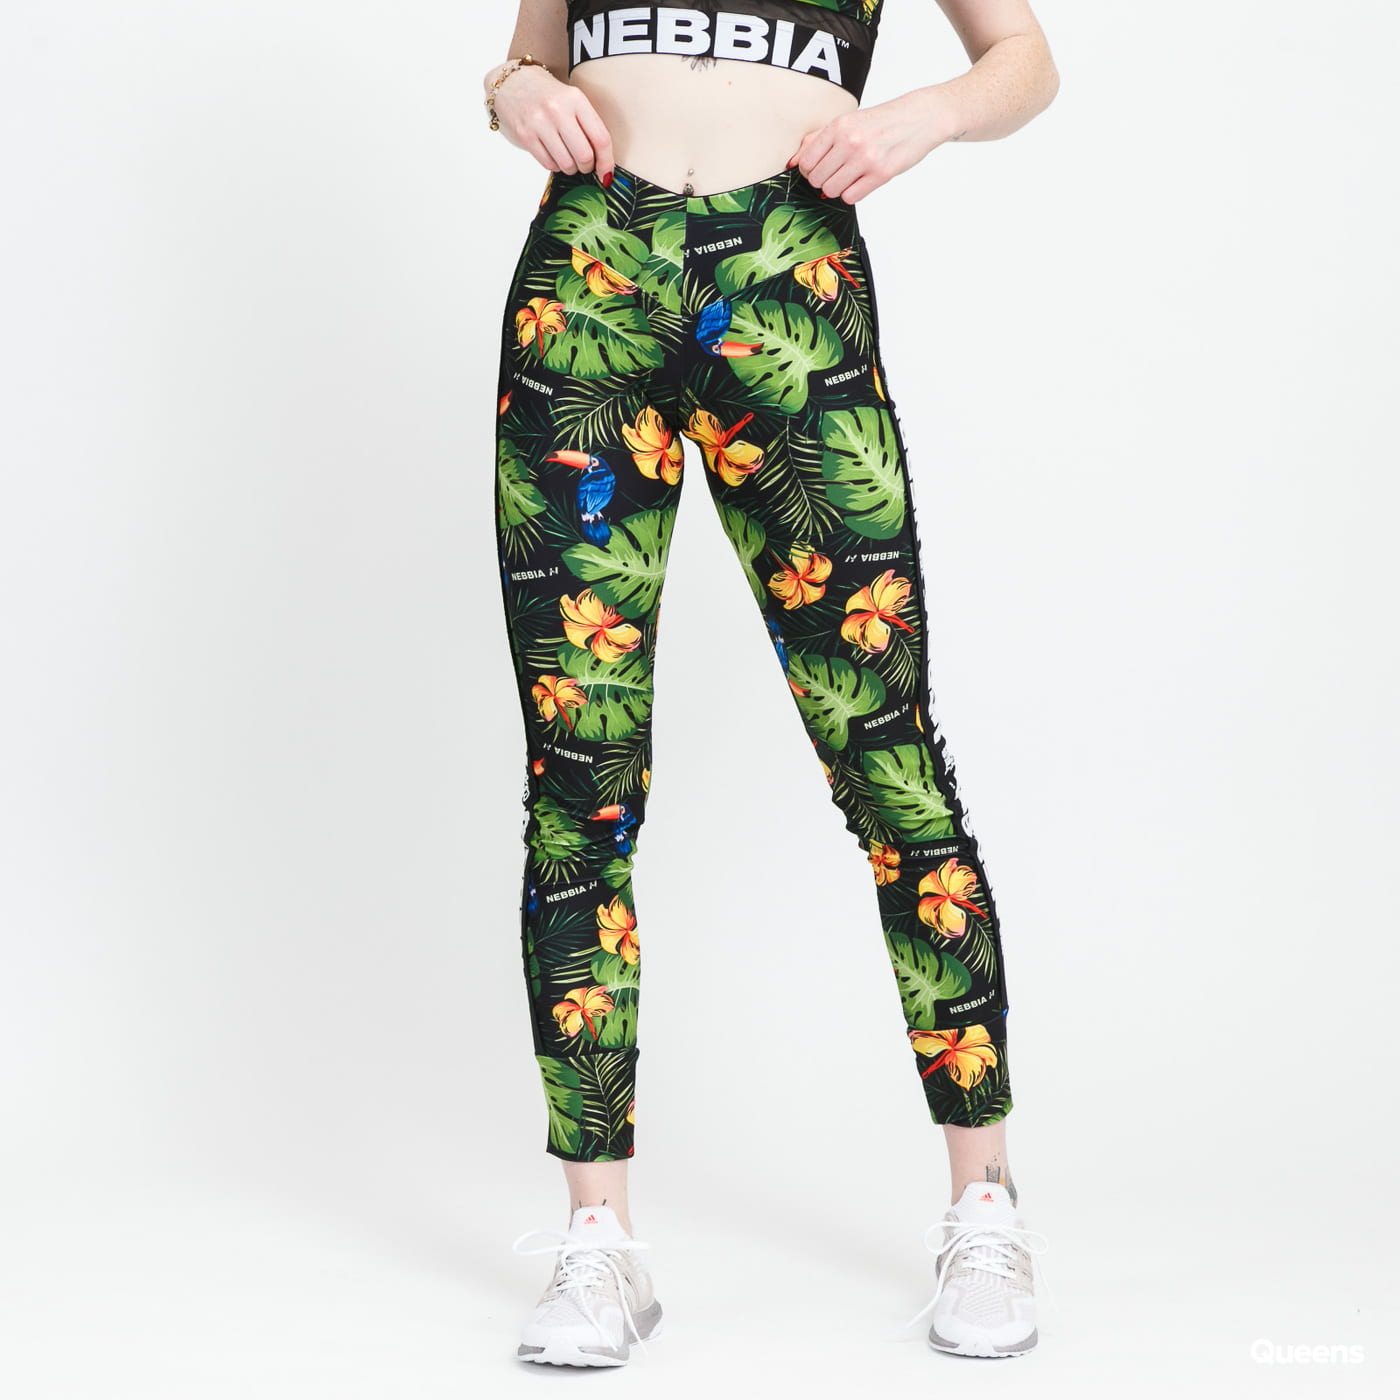 Nebbia High-Waist Performance Legging black / white / multicolor